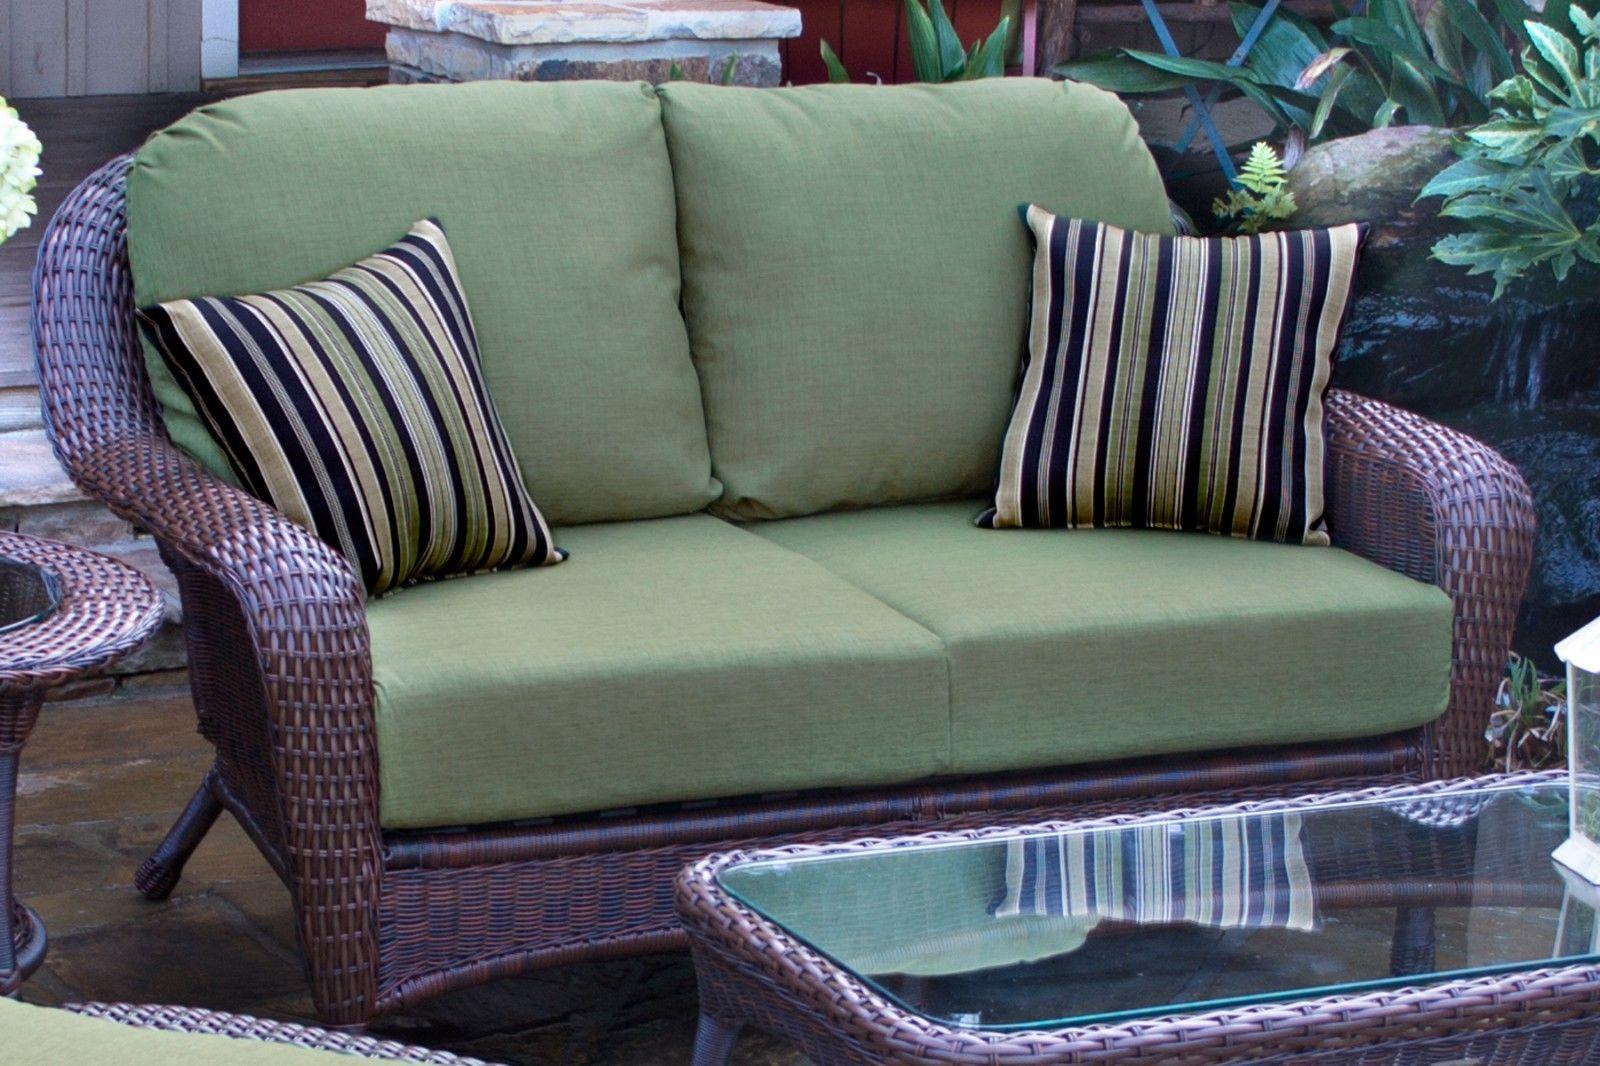 #94 - Outdoor Patio Garden Furniture Java Resin Wicker Love Seat in Rave Pine